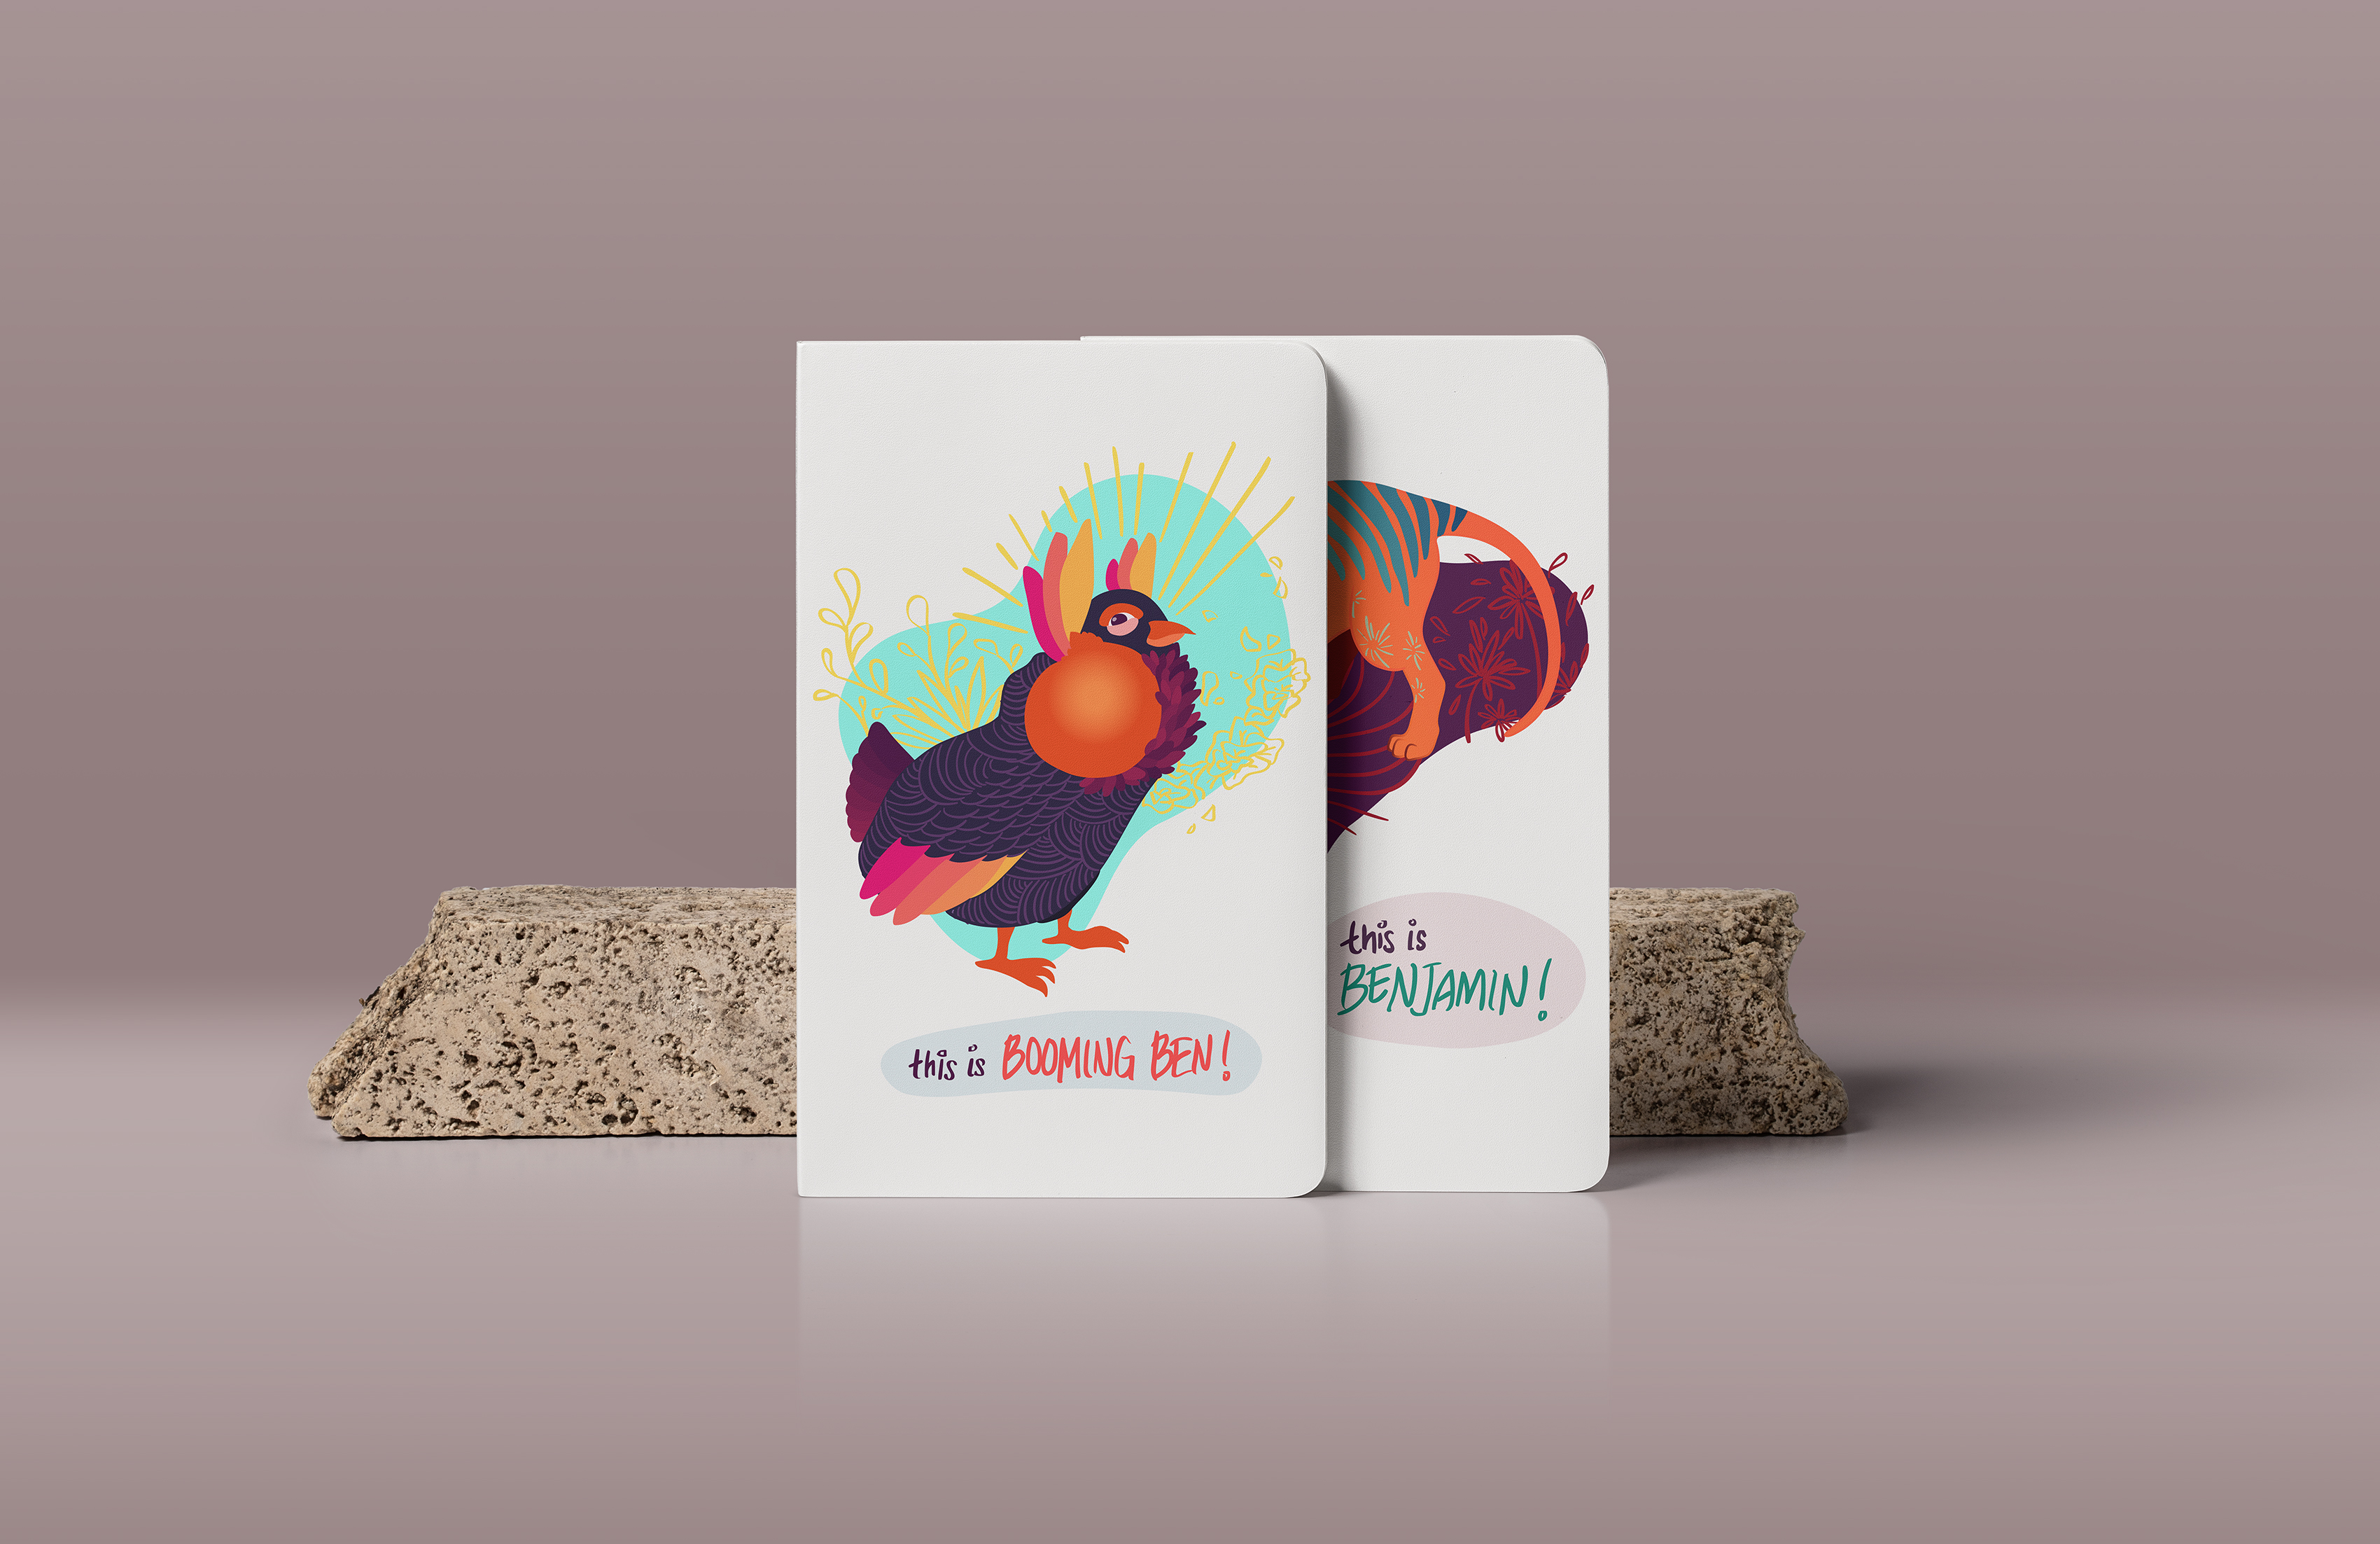 Illustration for Designers - G1 Lisa Winstanley